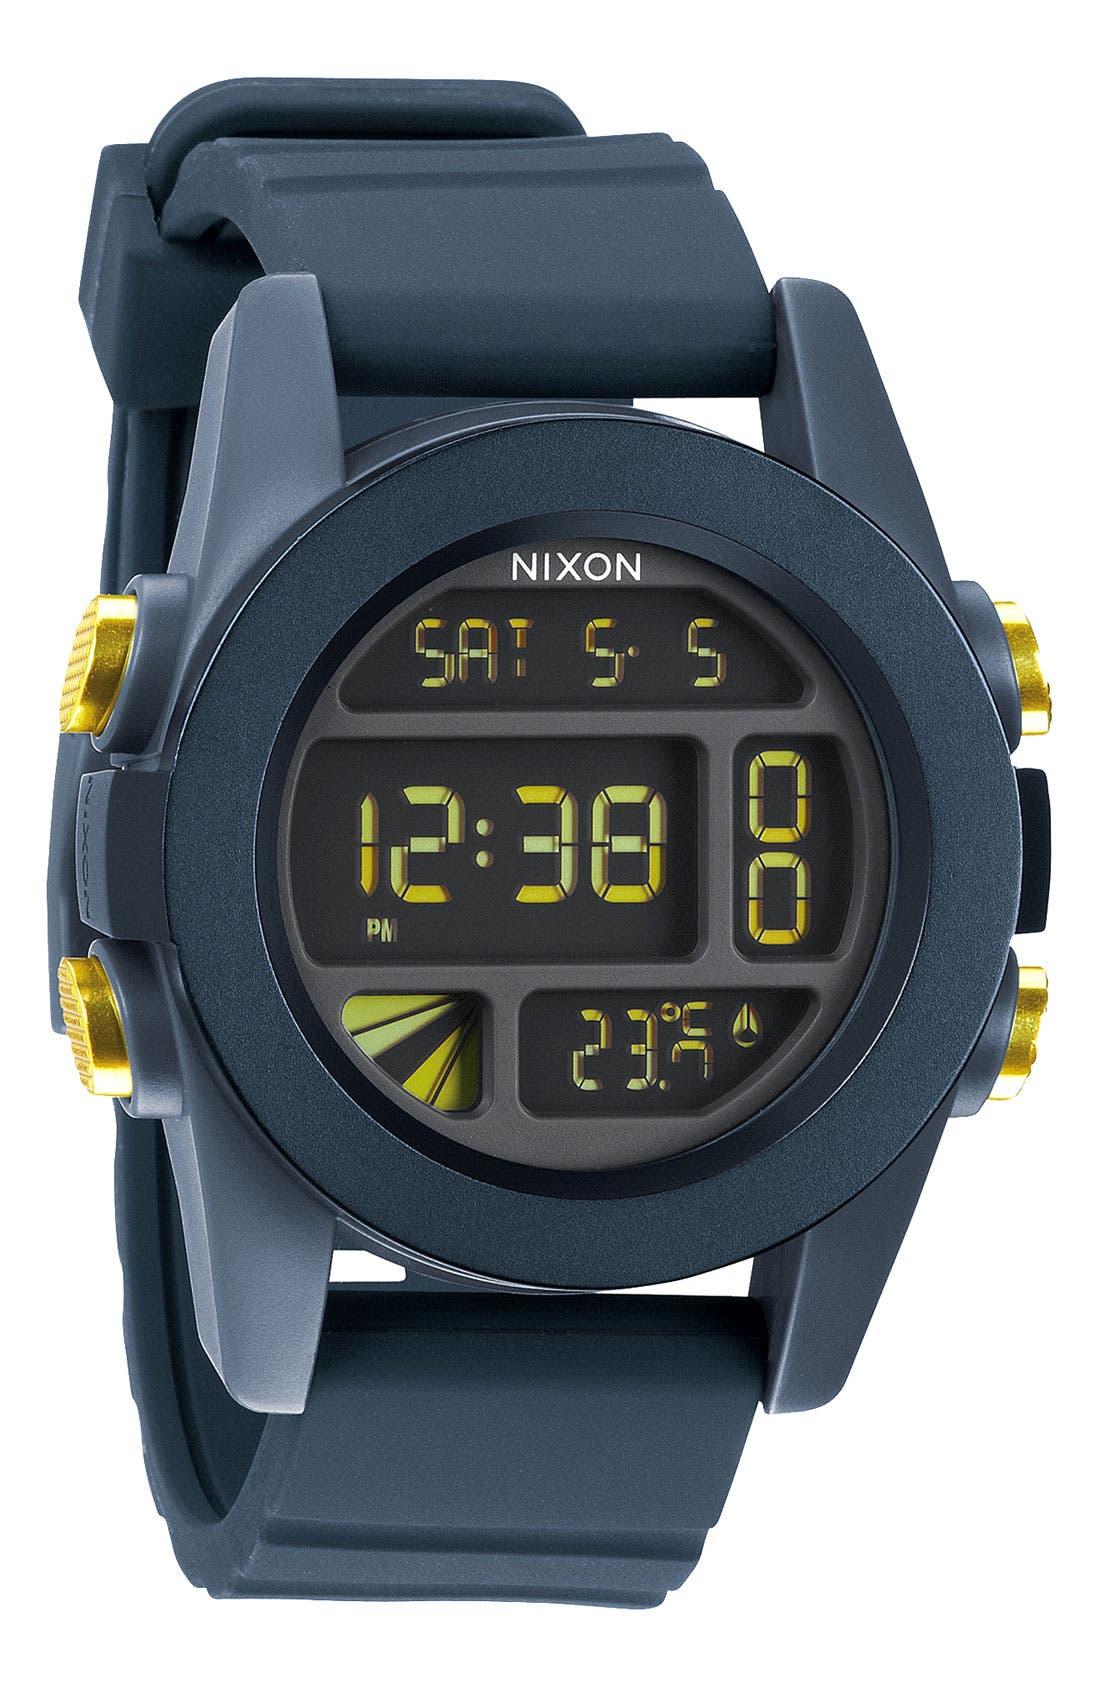 Alternate Image 1 Selected - Nixon 'The Anodaze Unit' Digital Watch, 49mm